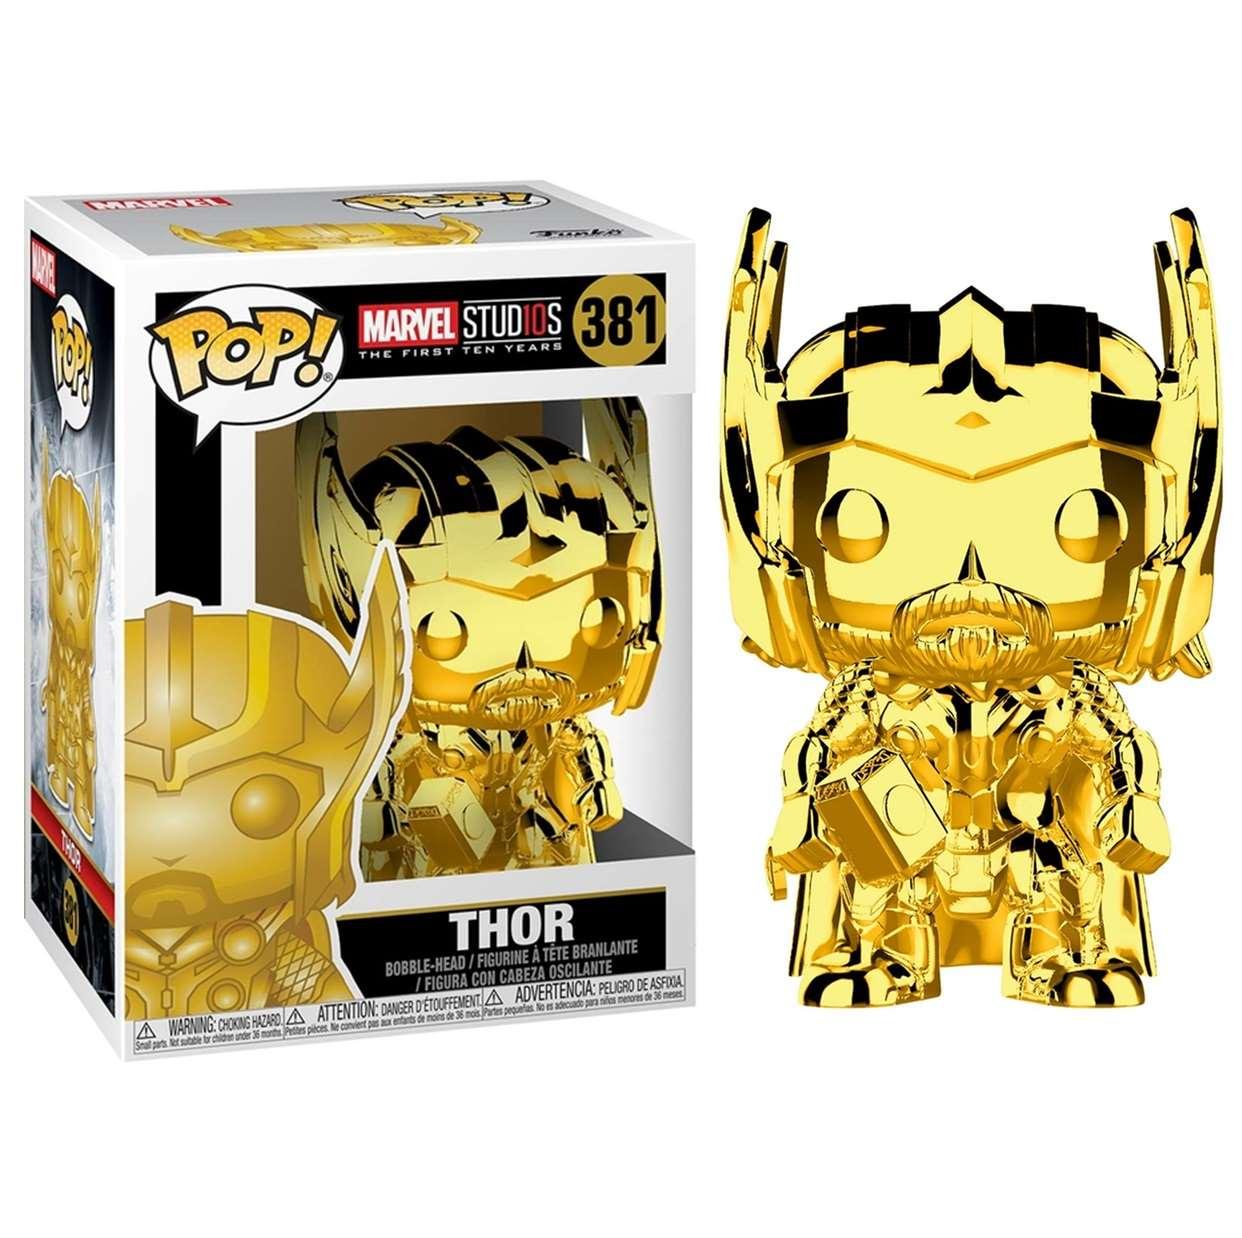 Thor #381 Figura Marvel Studios 10th Anniversary Funko Pop!